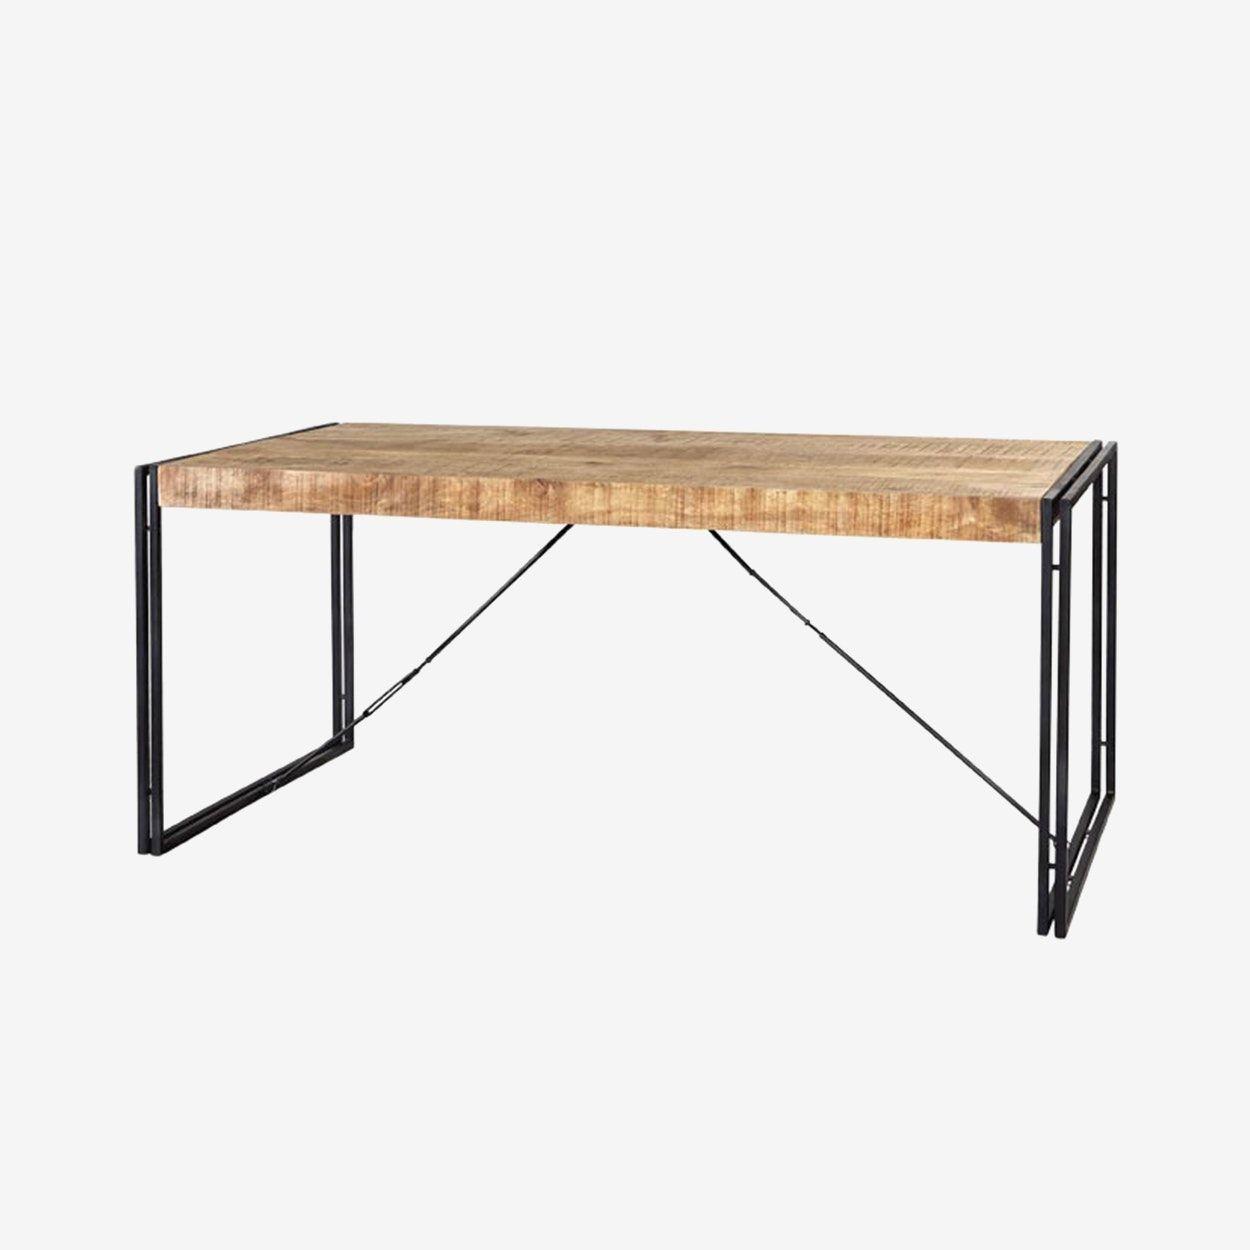 Mango Wood Metal Wood Dining Table Large Dining Table Wood